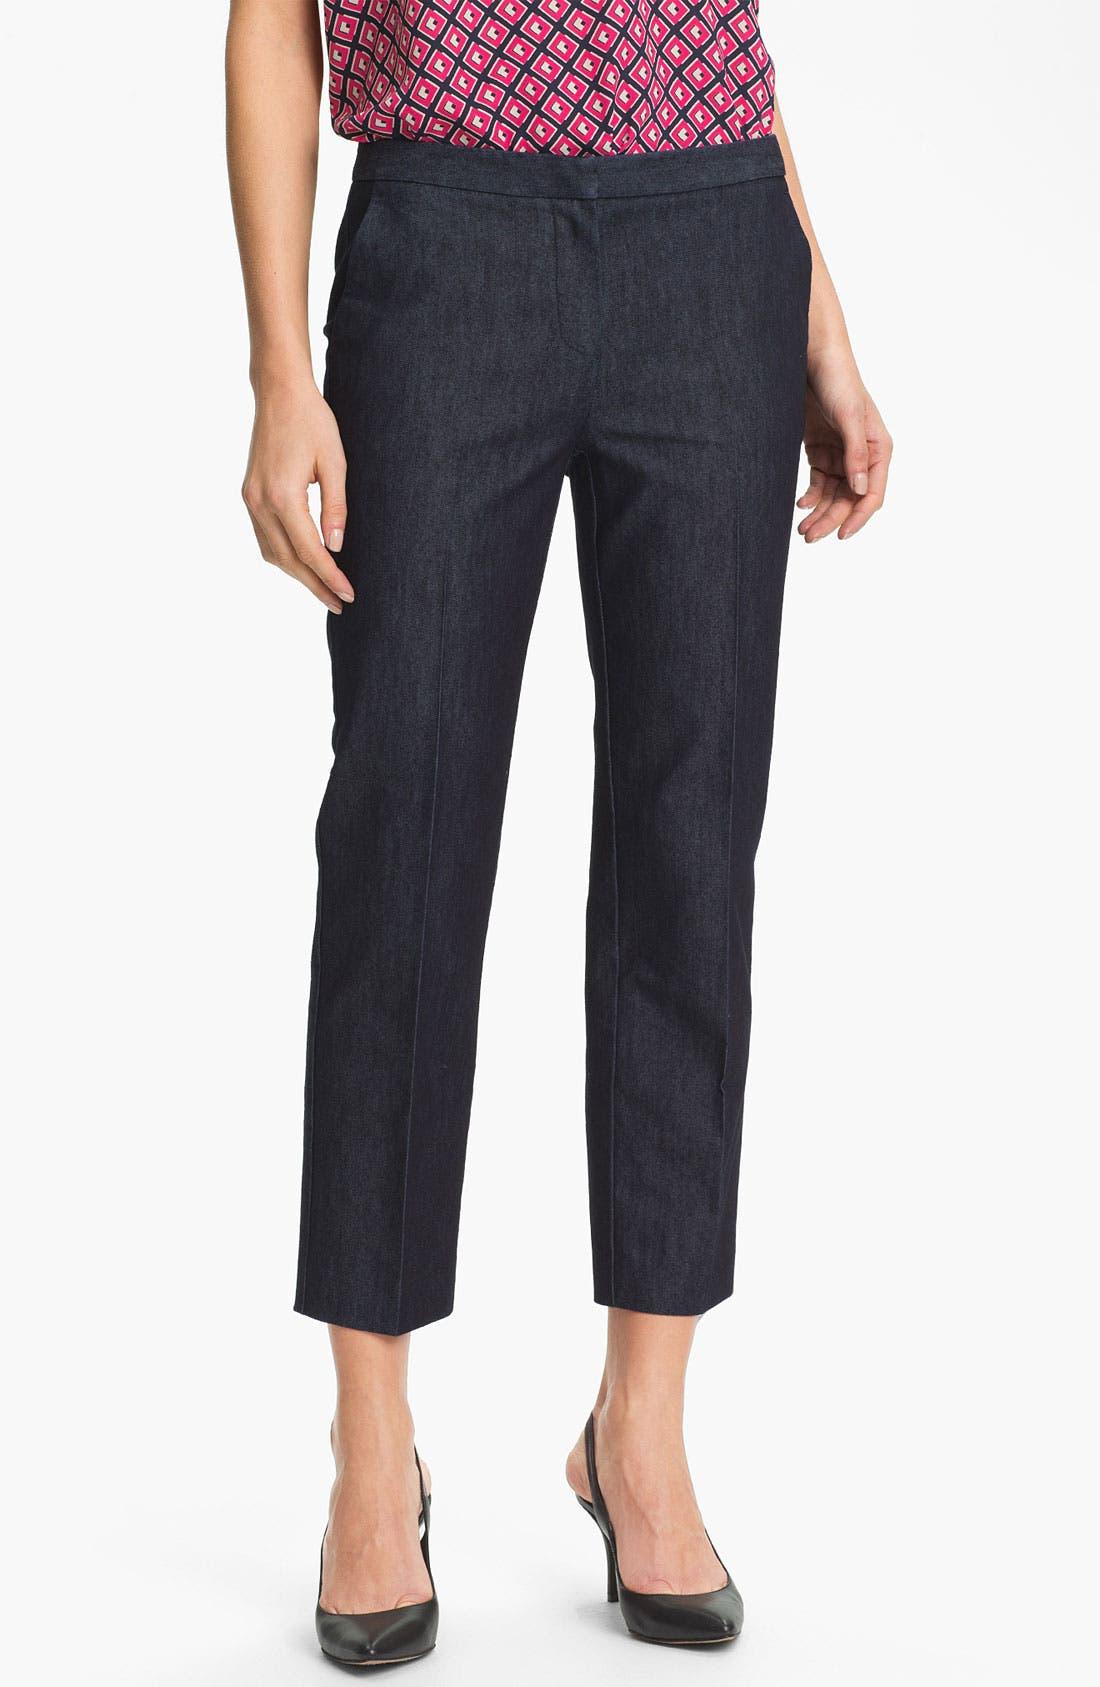 Alternate Image 1 Selected - Halogen® 'Taylor' Curvy Fit Crop Pants